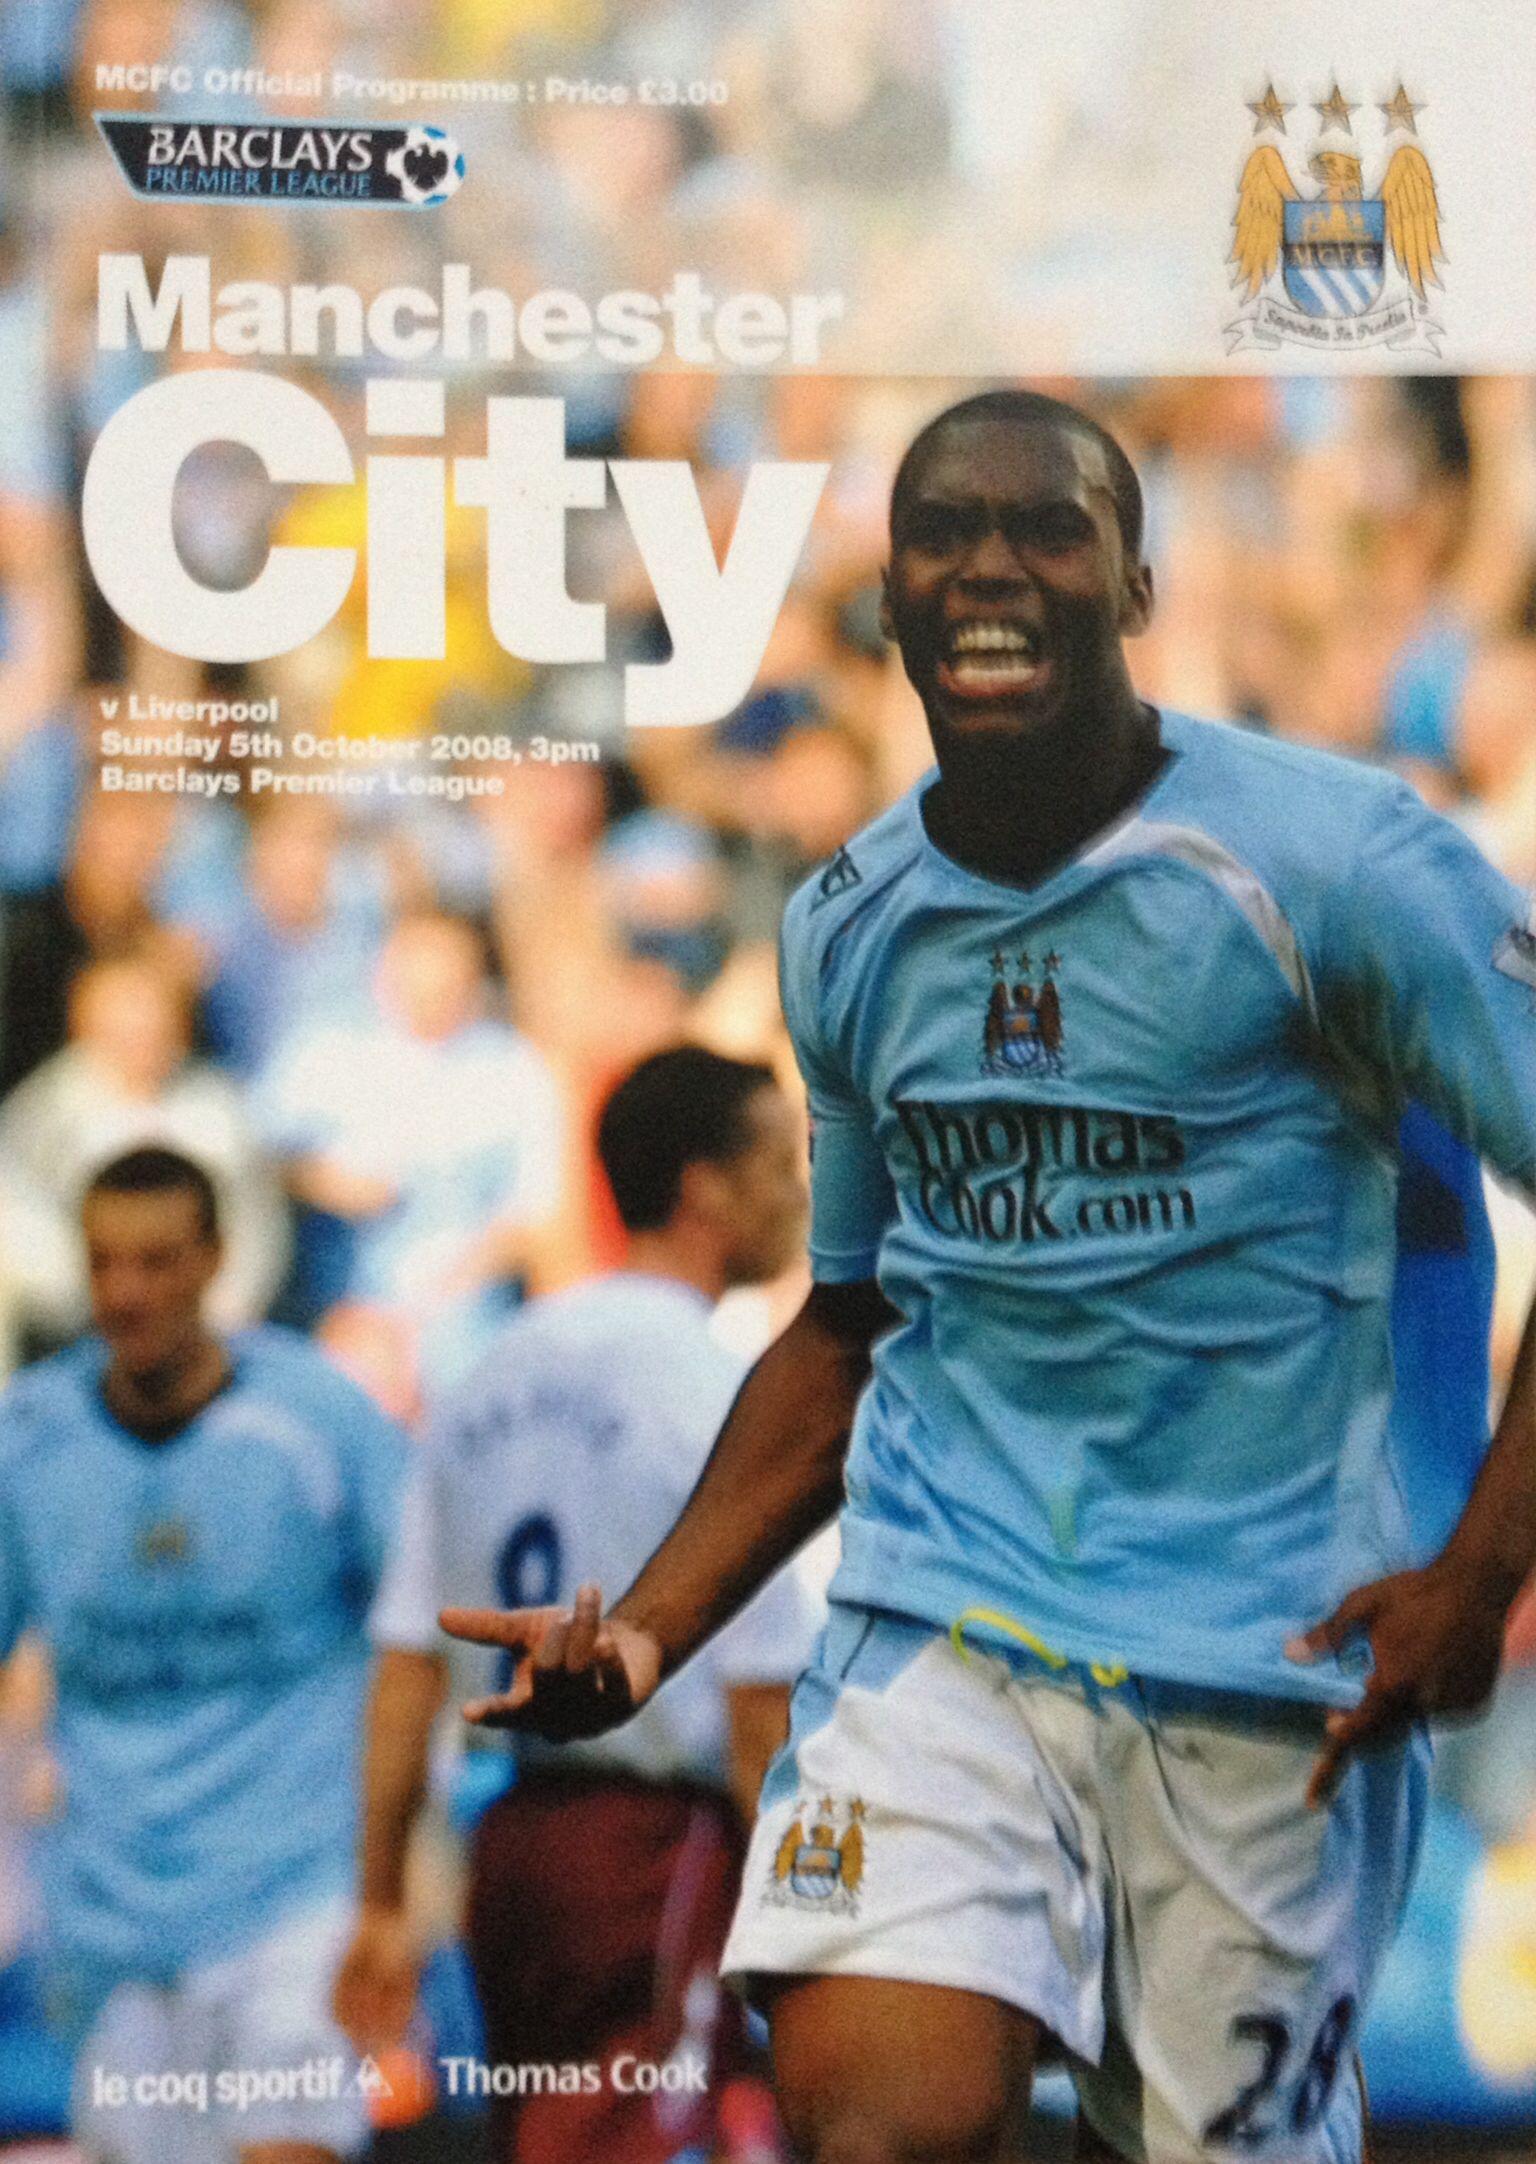 5/10/2008 Manchester City v Liverpool Liverpool